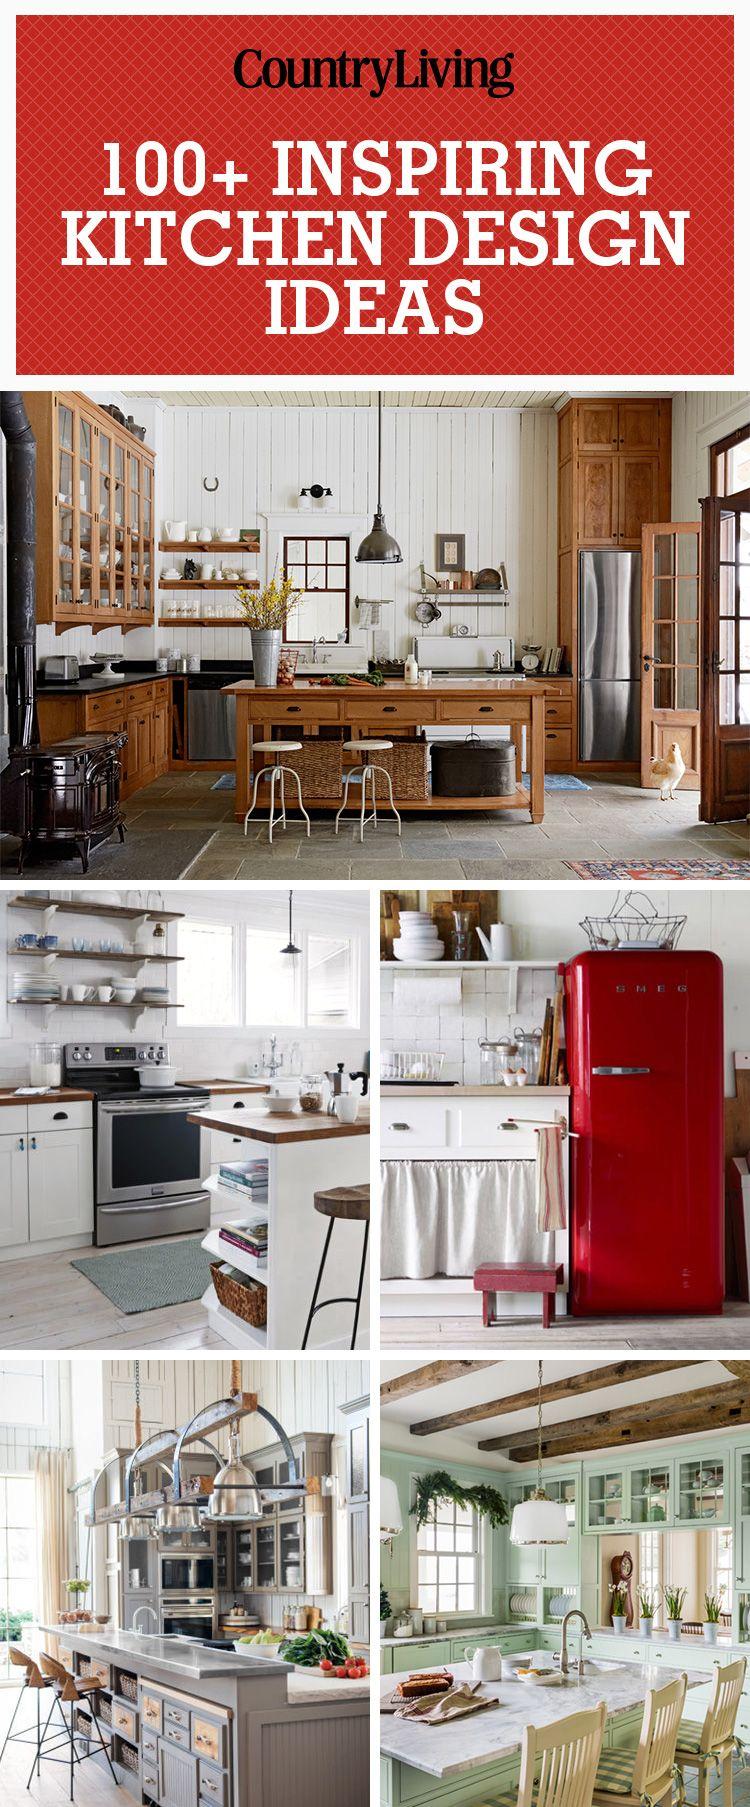 Cute Country Kitchen Decoratinginspiration Kitchen Design Ideas S Kitchen Design Ideas Kitchen Design Ideas S Country Kitchen Decorating Good Ideas Kitchen Designs kitchen Ideas For Kitchen Design